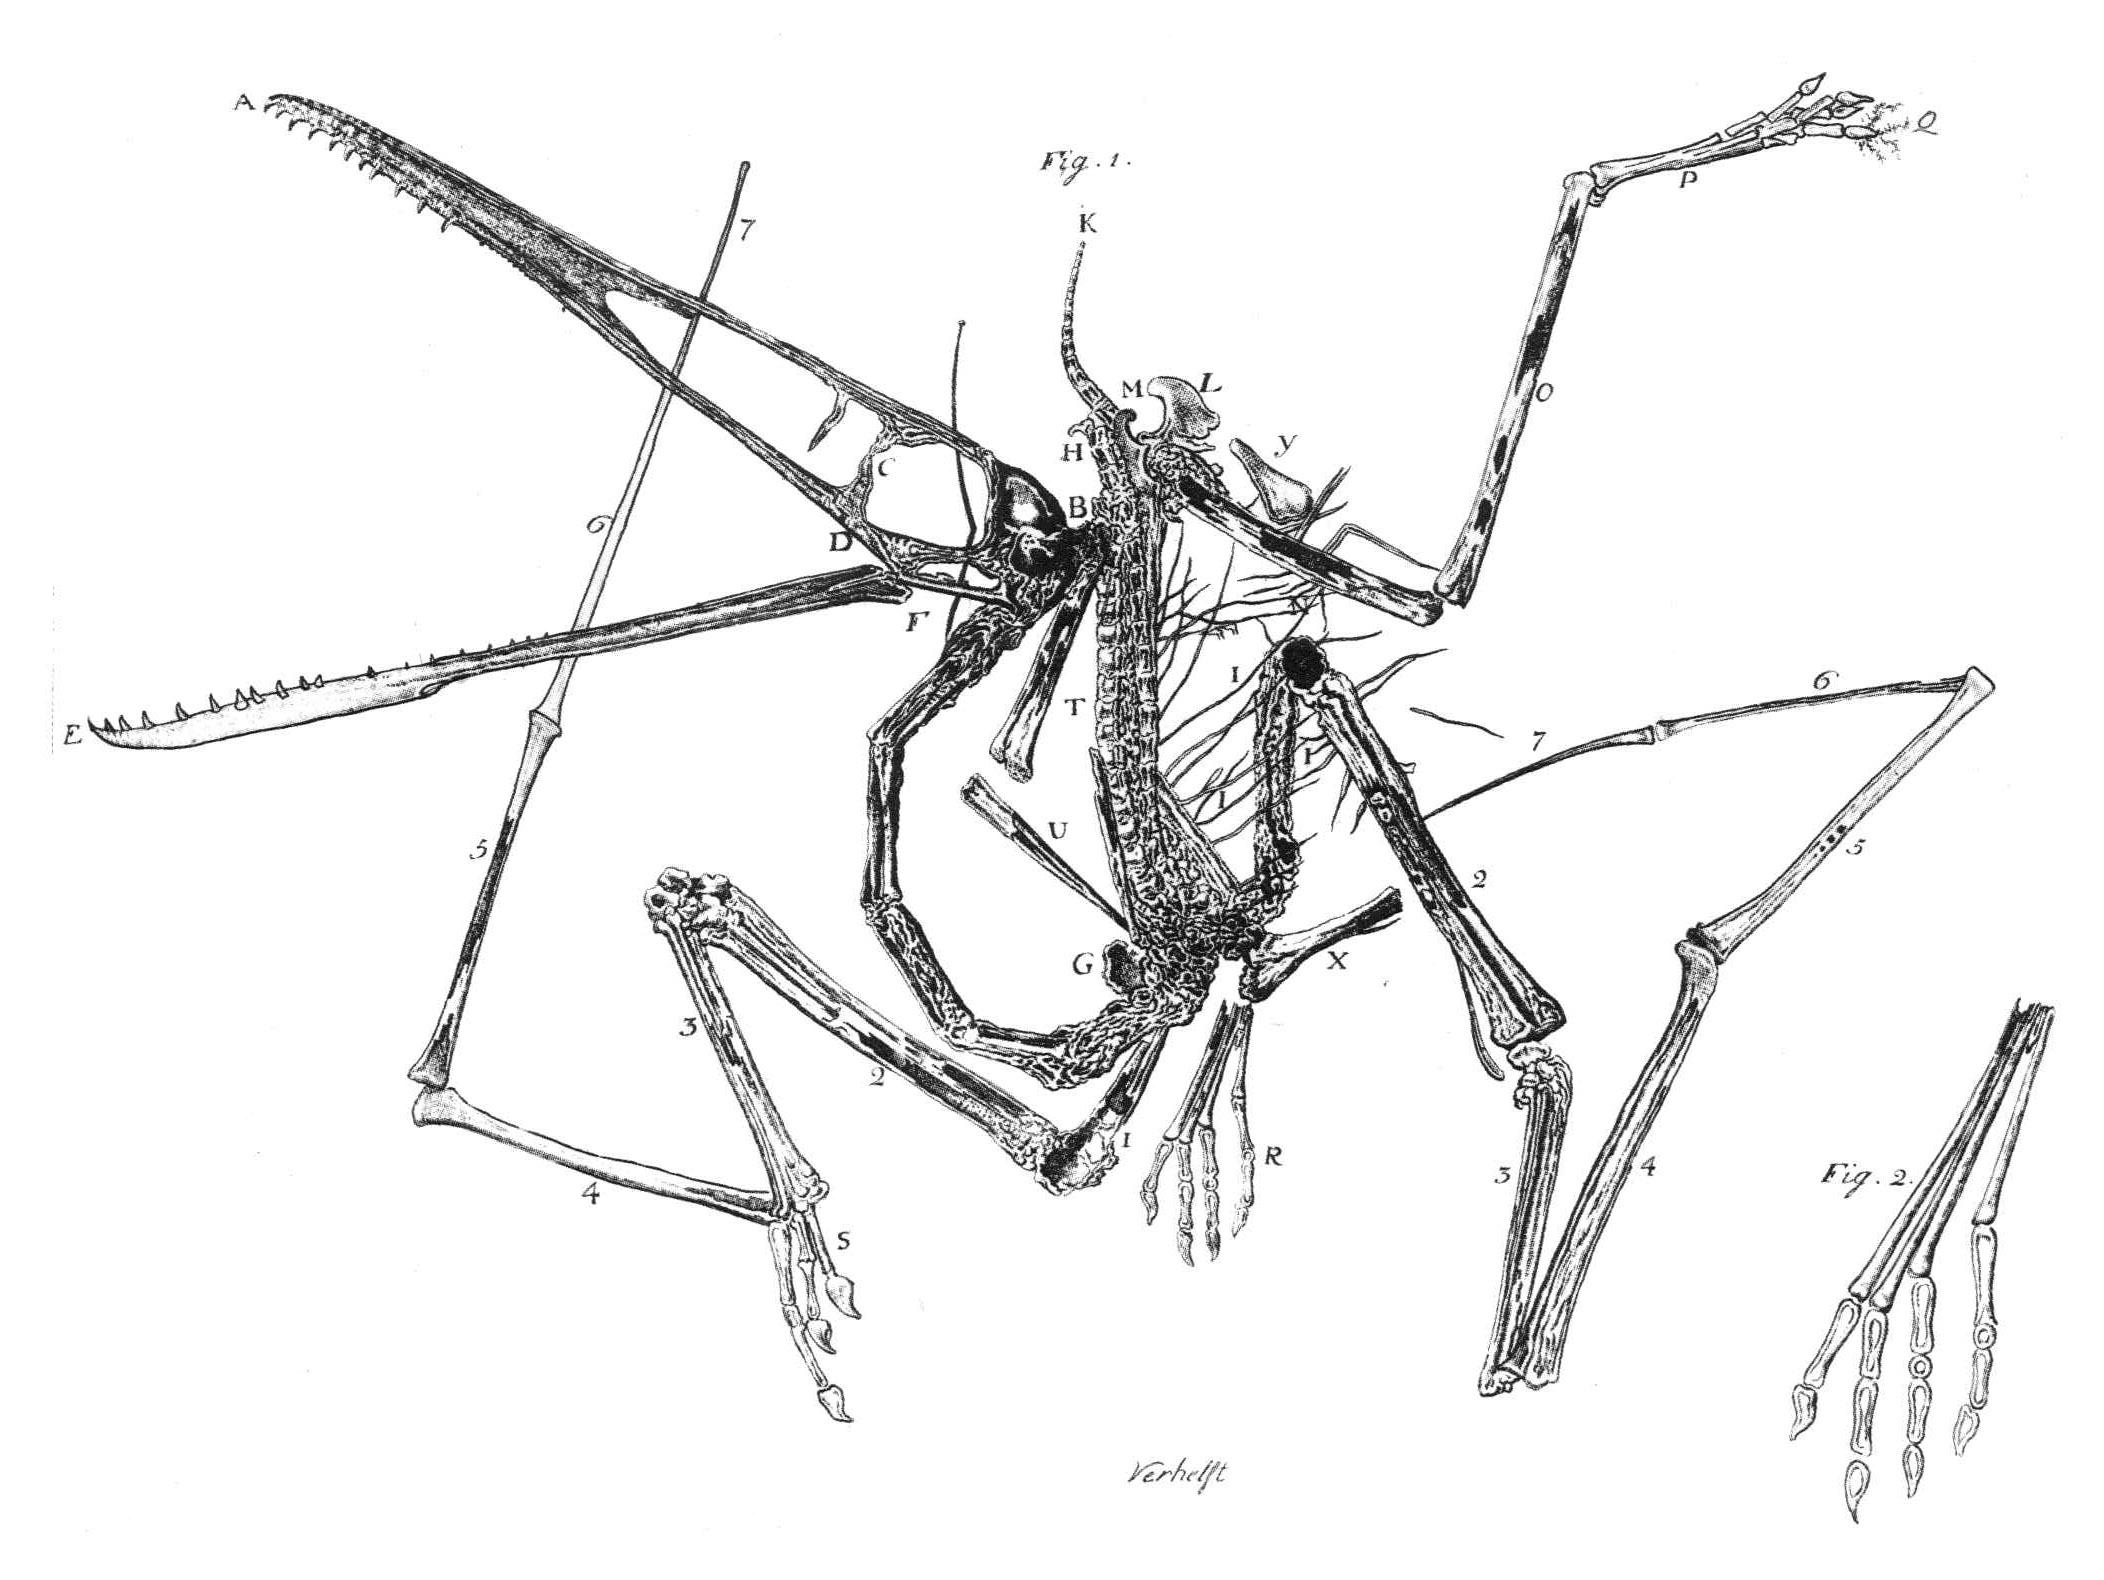 https://i2.wp.com/upload.wikimedia.org/wikipedia/commons/c/cf/Pterodactylus_holotype_Collini_1784.jpg